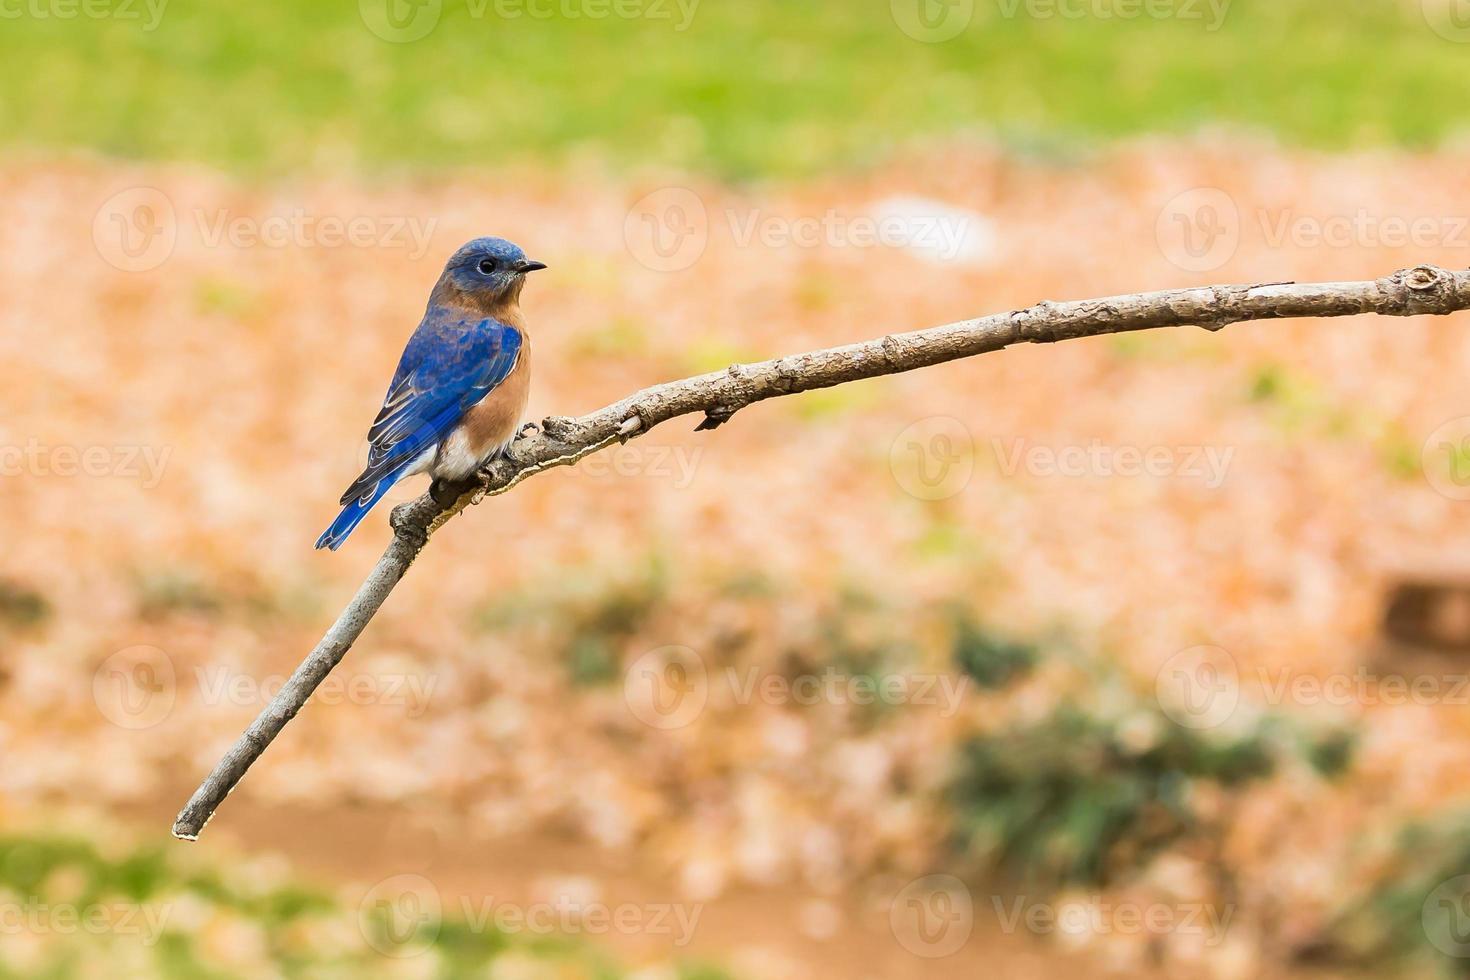 Eastern Bluebird photo